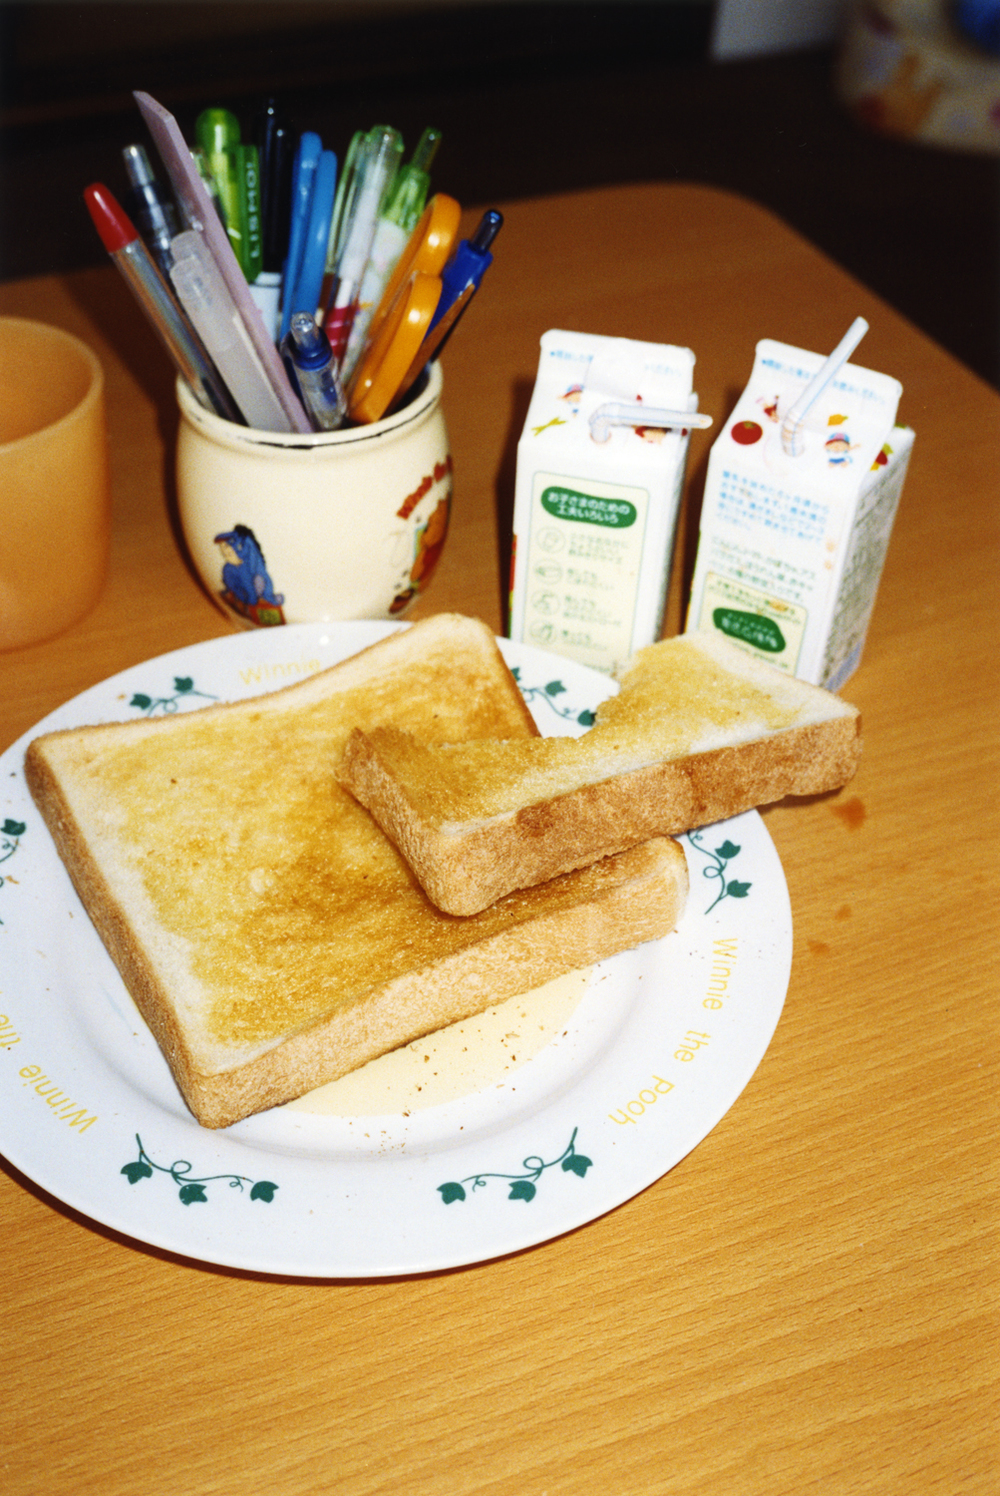 Motoyuki Daifu   Toast  , 2011   c-print   20 x 24 inches   50.8 x 61 cm